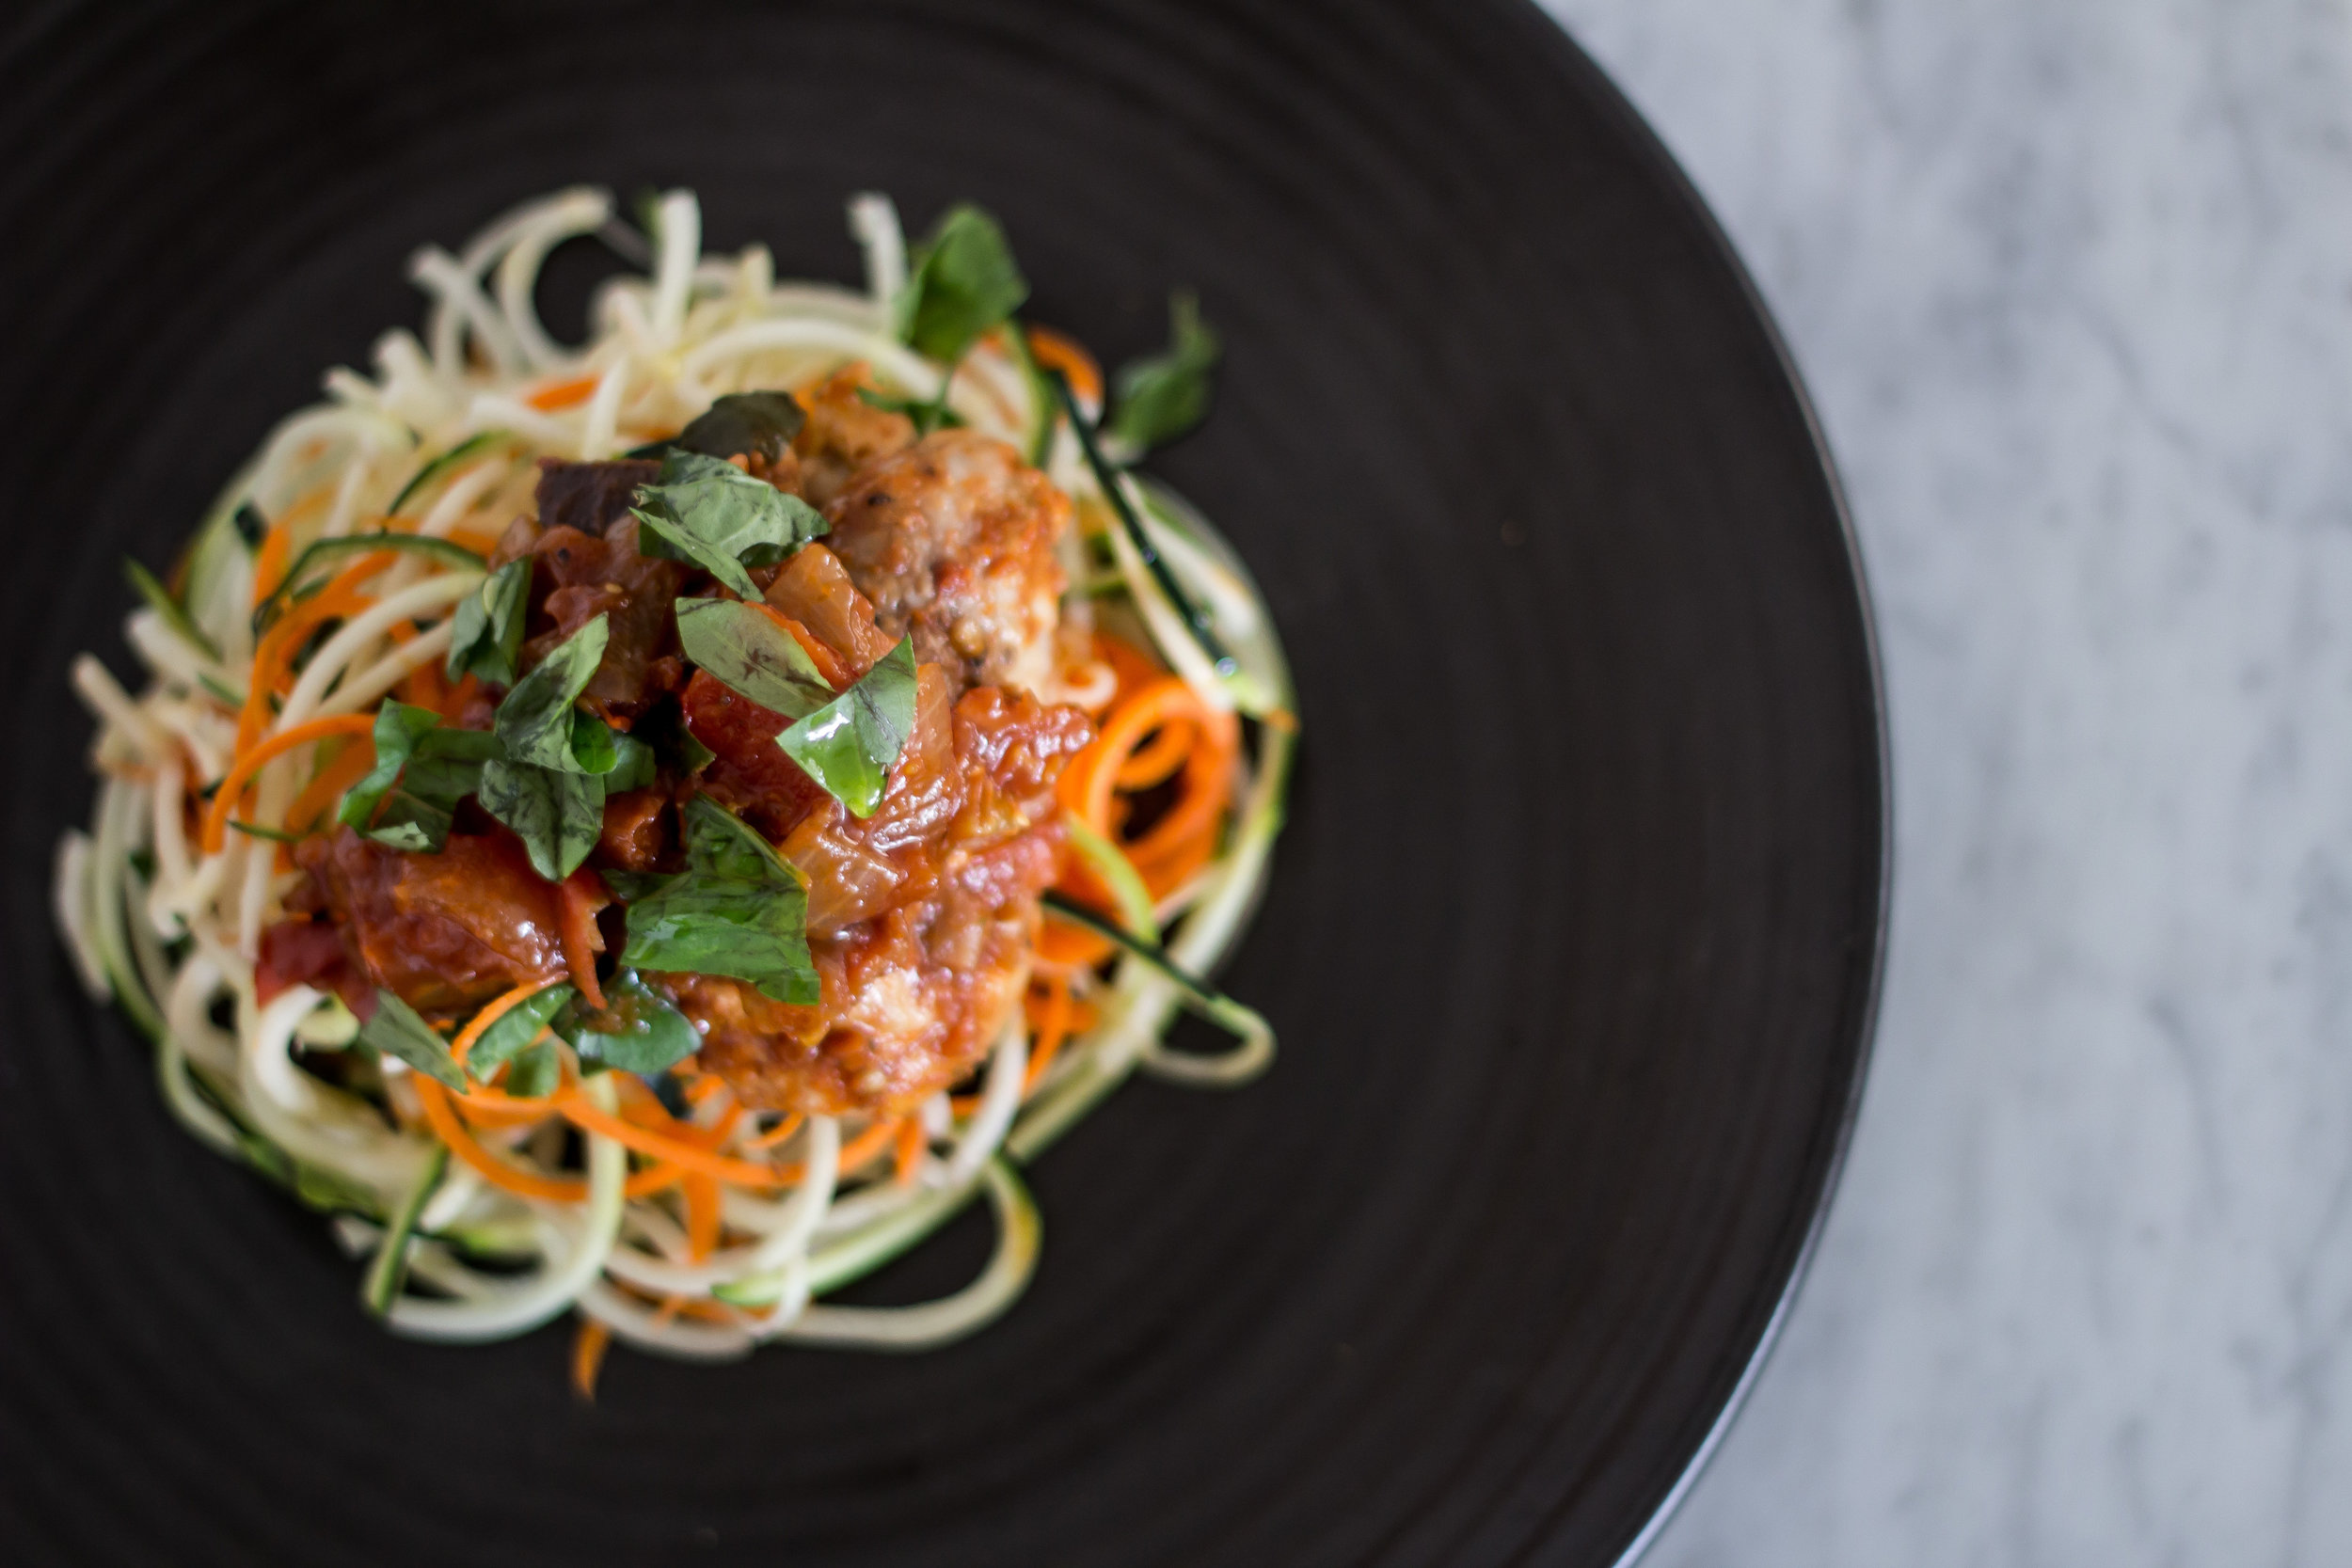 This healthy Mediterranean Vegetable & pesto noodle salad is nourishing, quick to prepare & delicious.